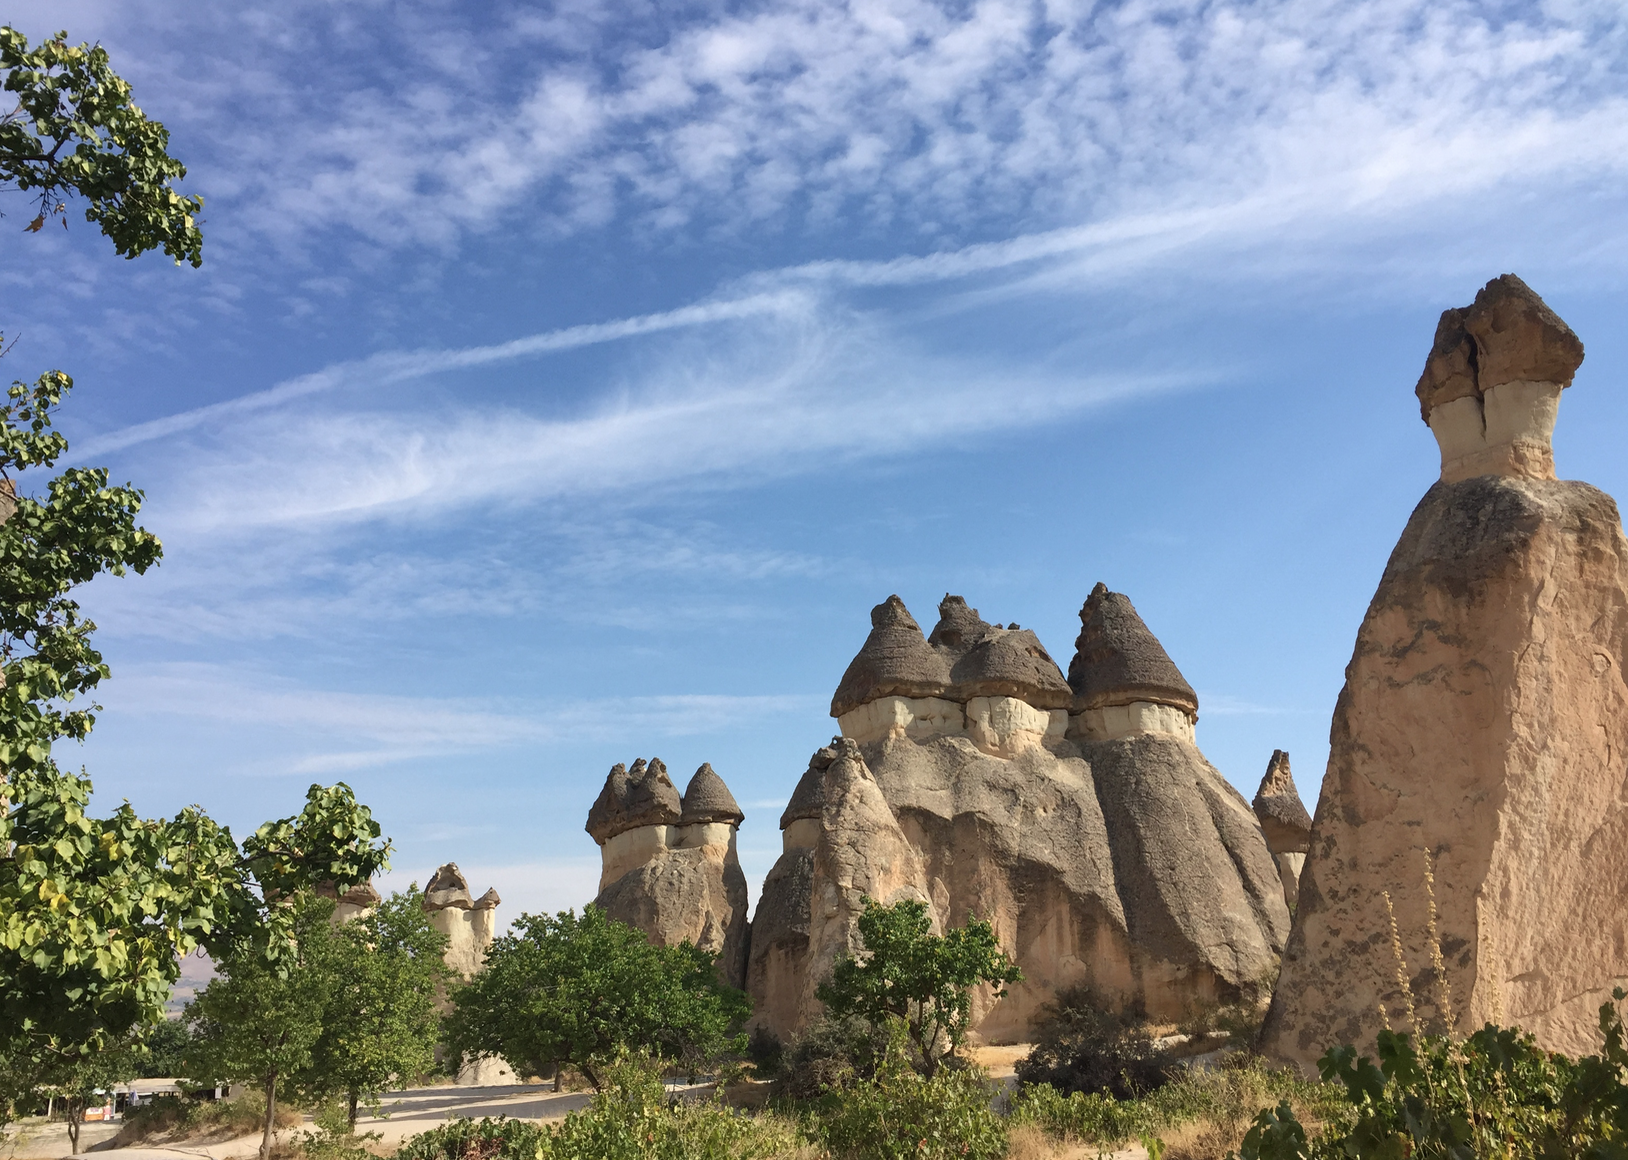 kappadokien med engelsk guide, kappadokien med guide, rejs fra alanya til kappadokien, cappadocia med engelsk guide, cappadocia med engelsk rejseledsager, alanya, eurodan alanya, kappadokien.dk,